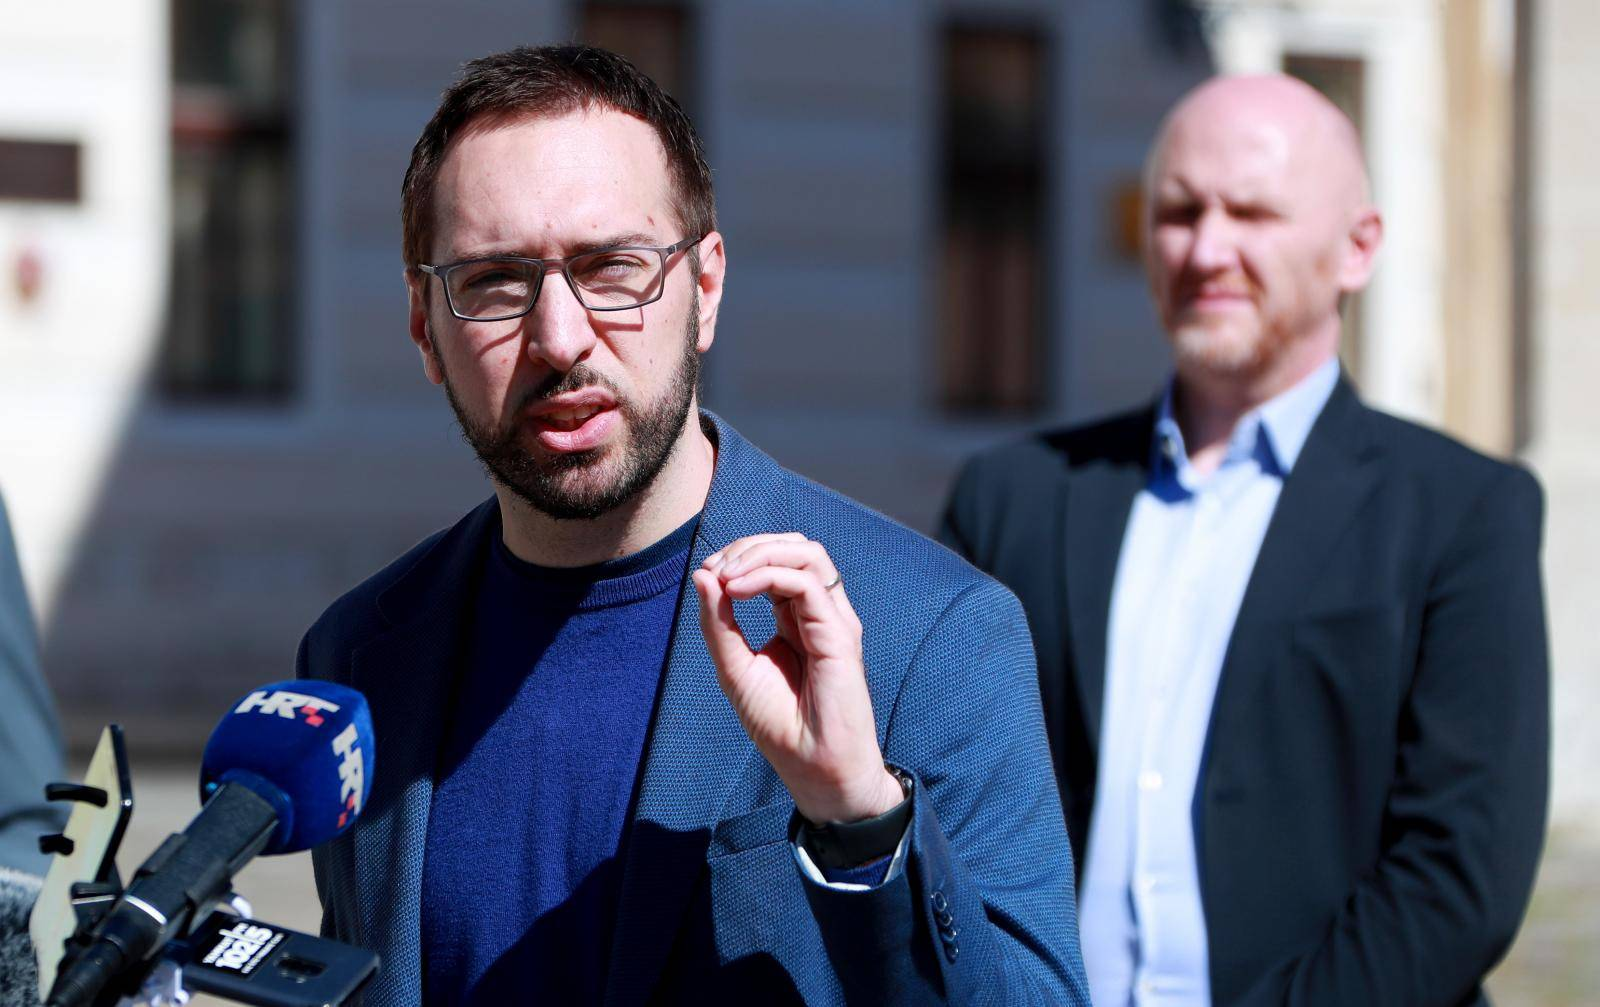 Tomislav Tomasevic Zagreb Je U Rusevinama A Plenkovic Stavlja Interese Hdz A Ispred Obnove 24sata